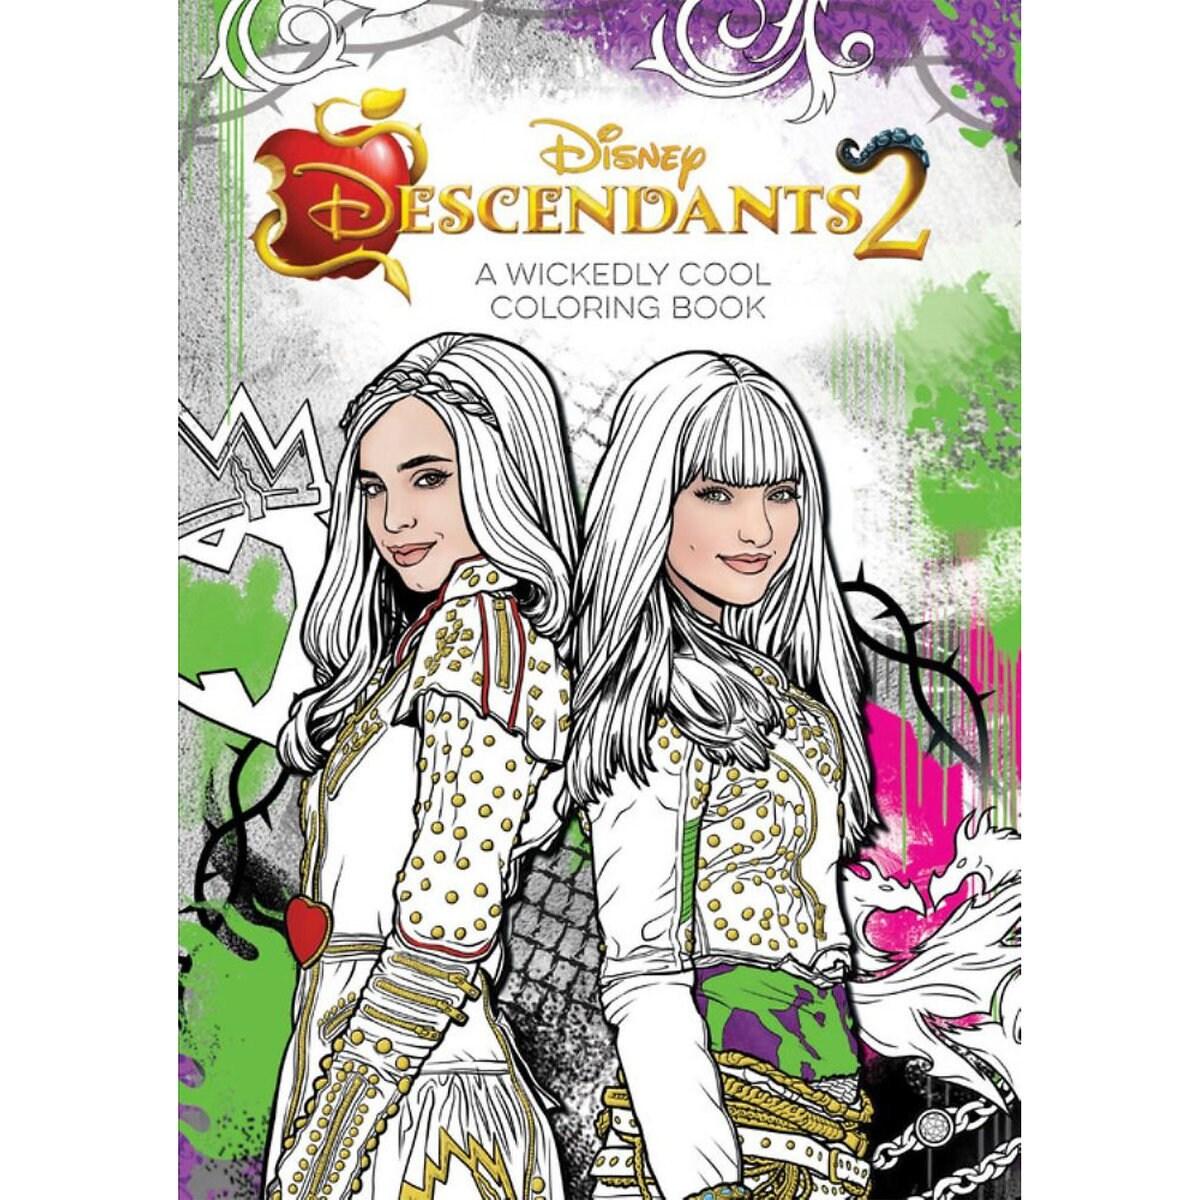 Descendants 2: A Wickedly Cool Coloring Book | shopDisney